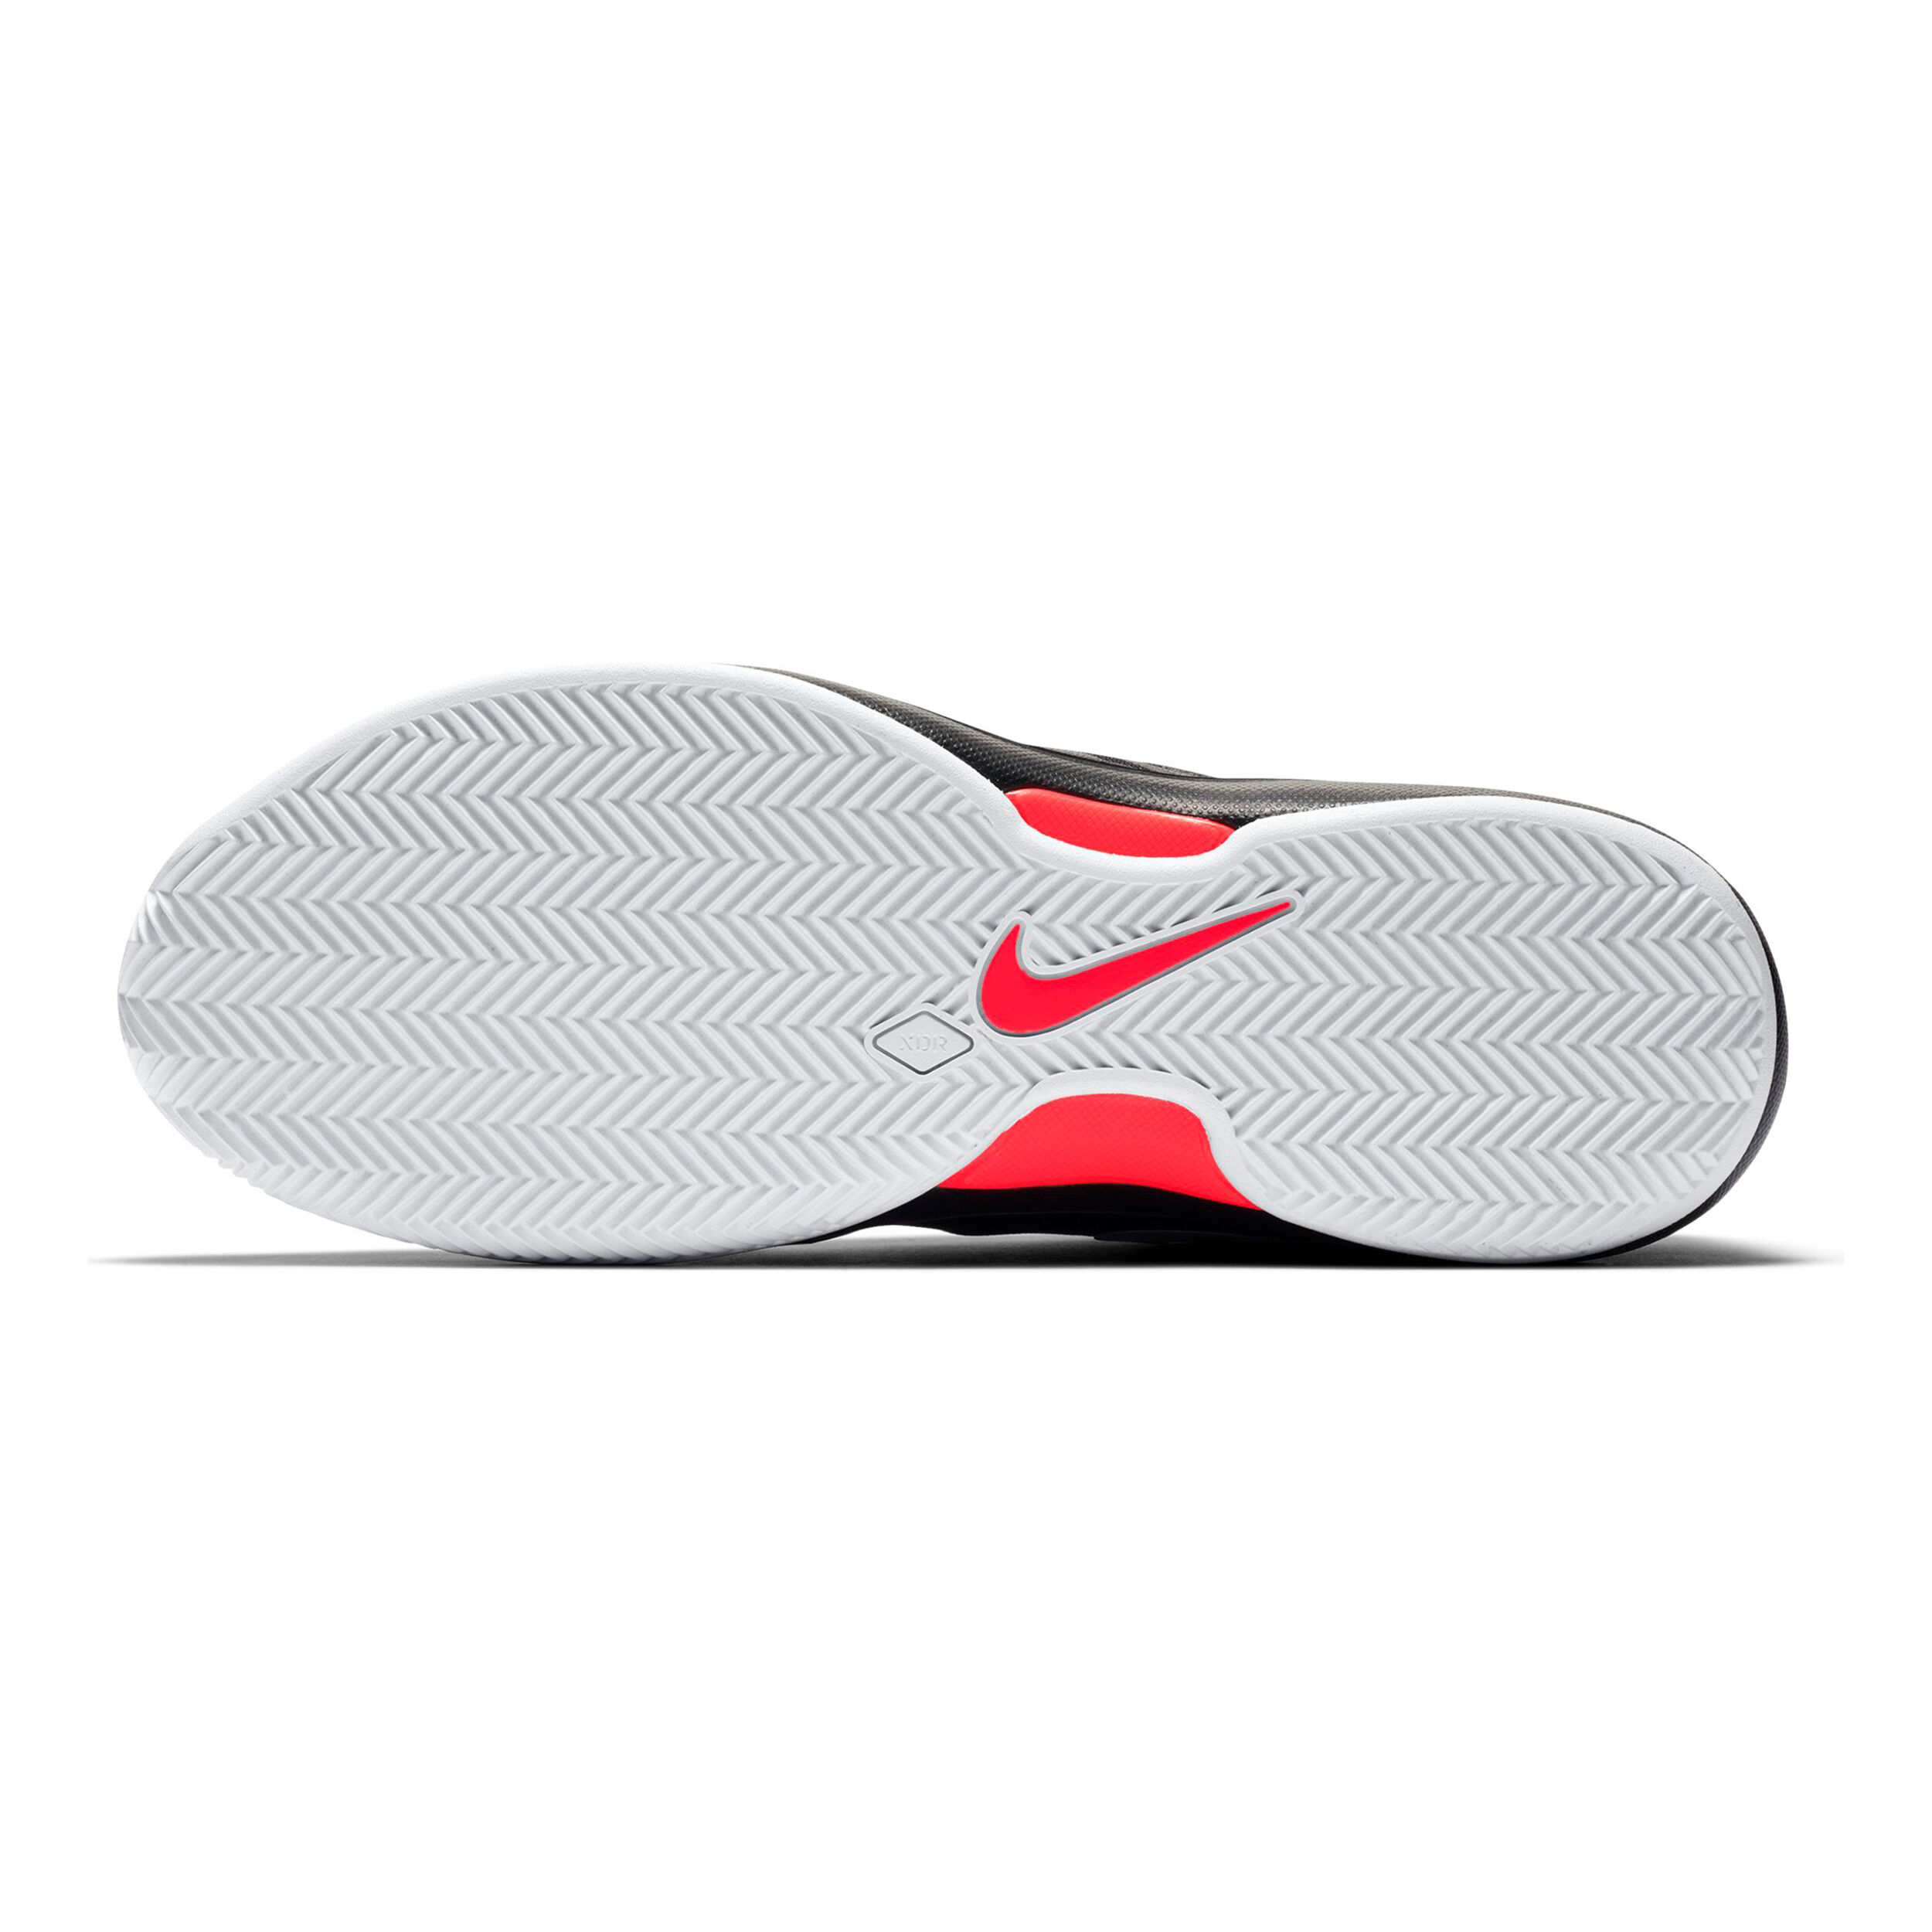 Nike Hommes Chaussures De Tennis Nike Air Zoom Prestige Clay Noir